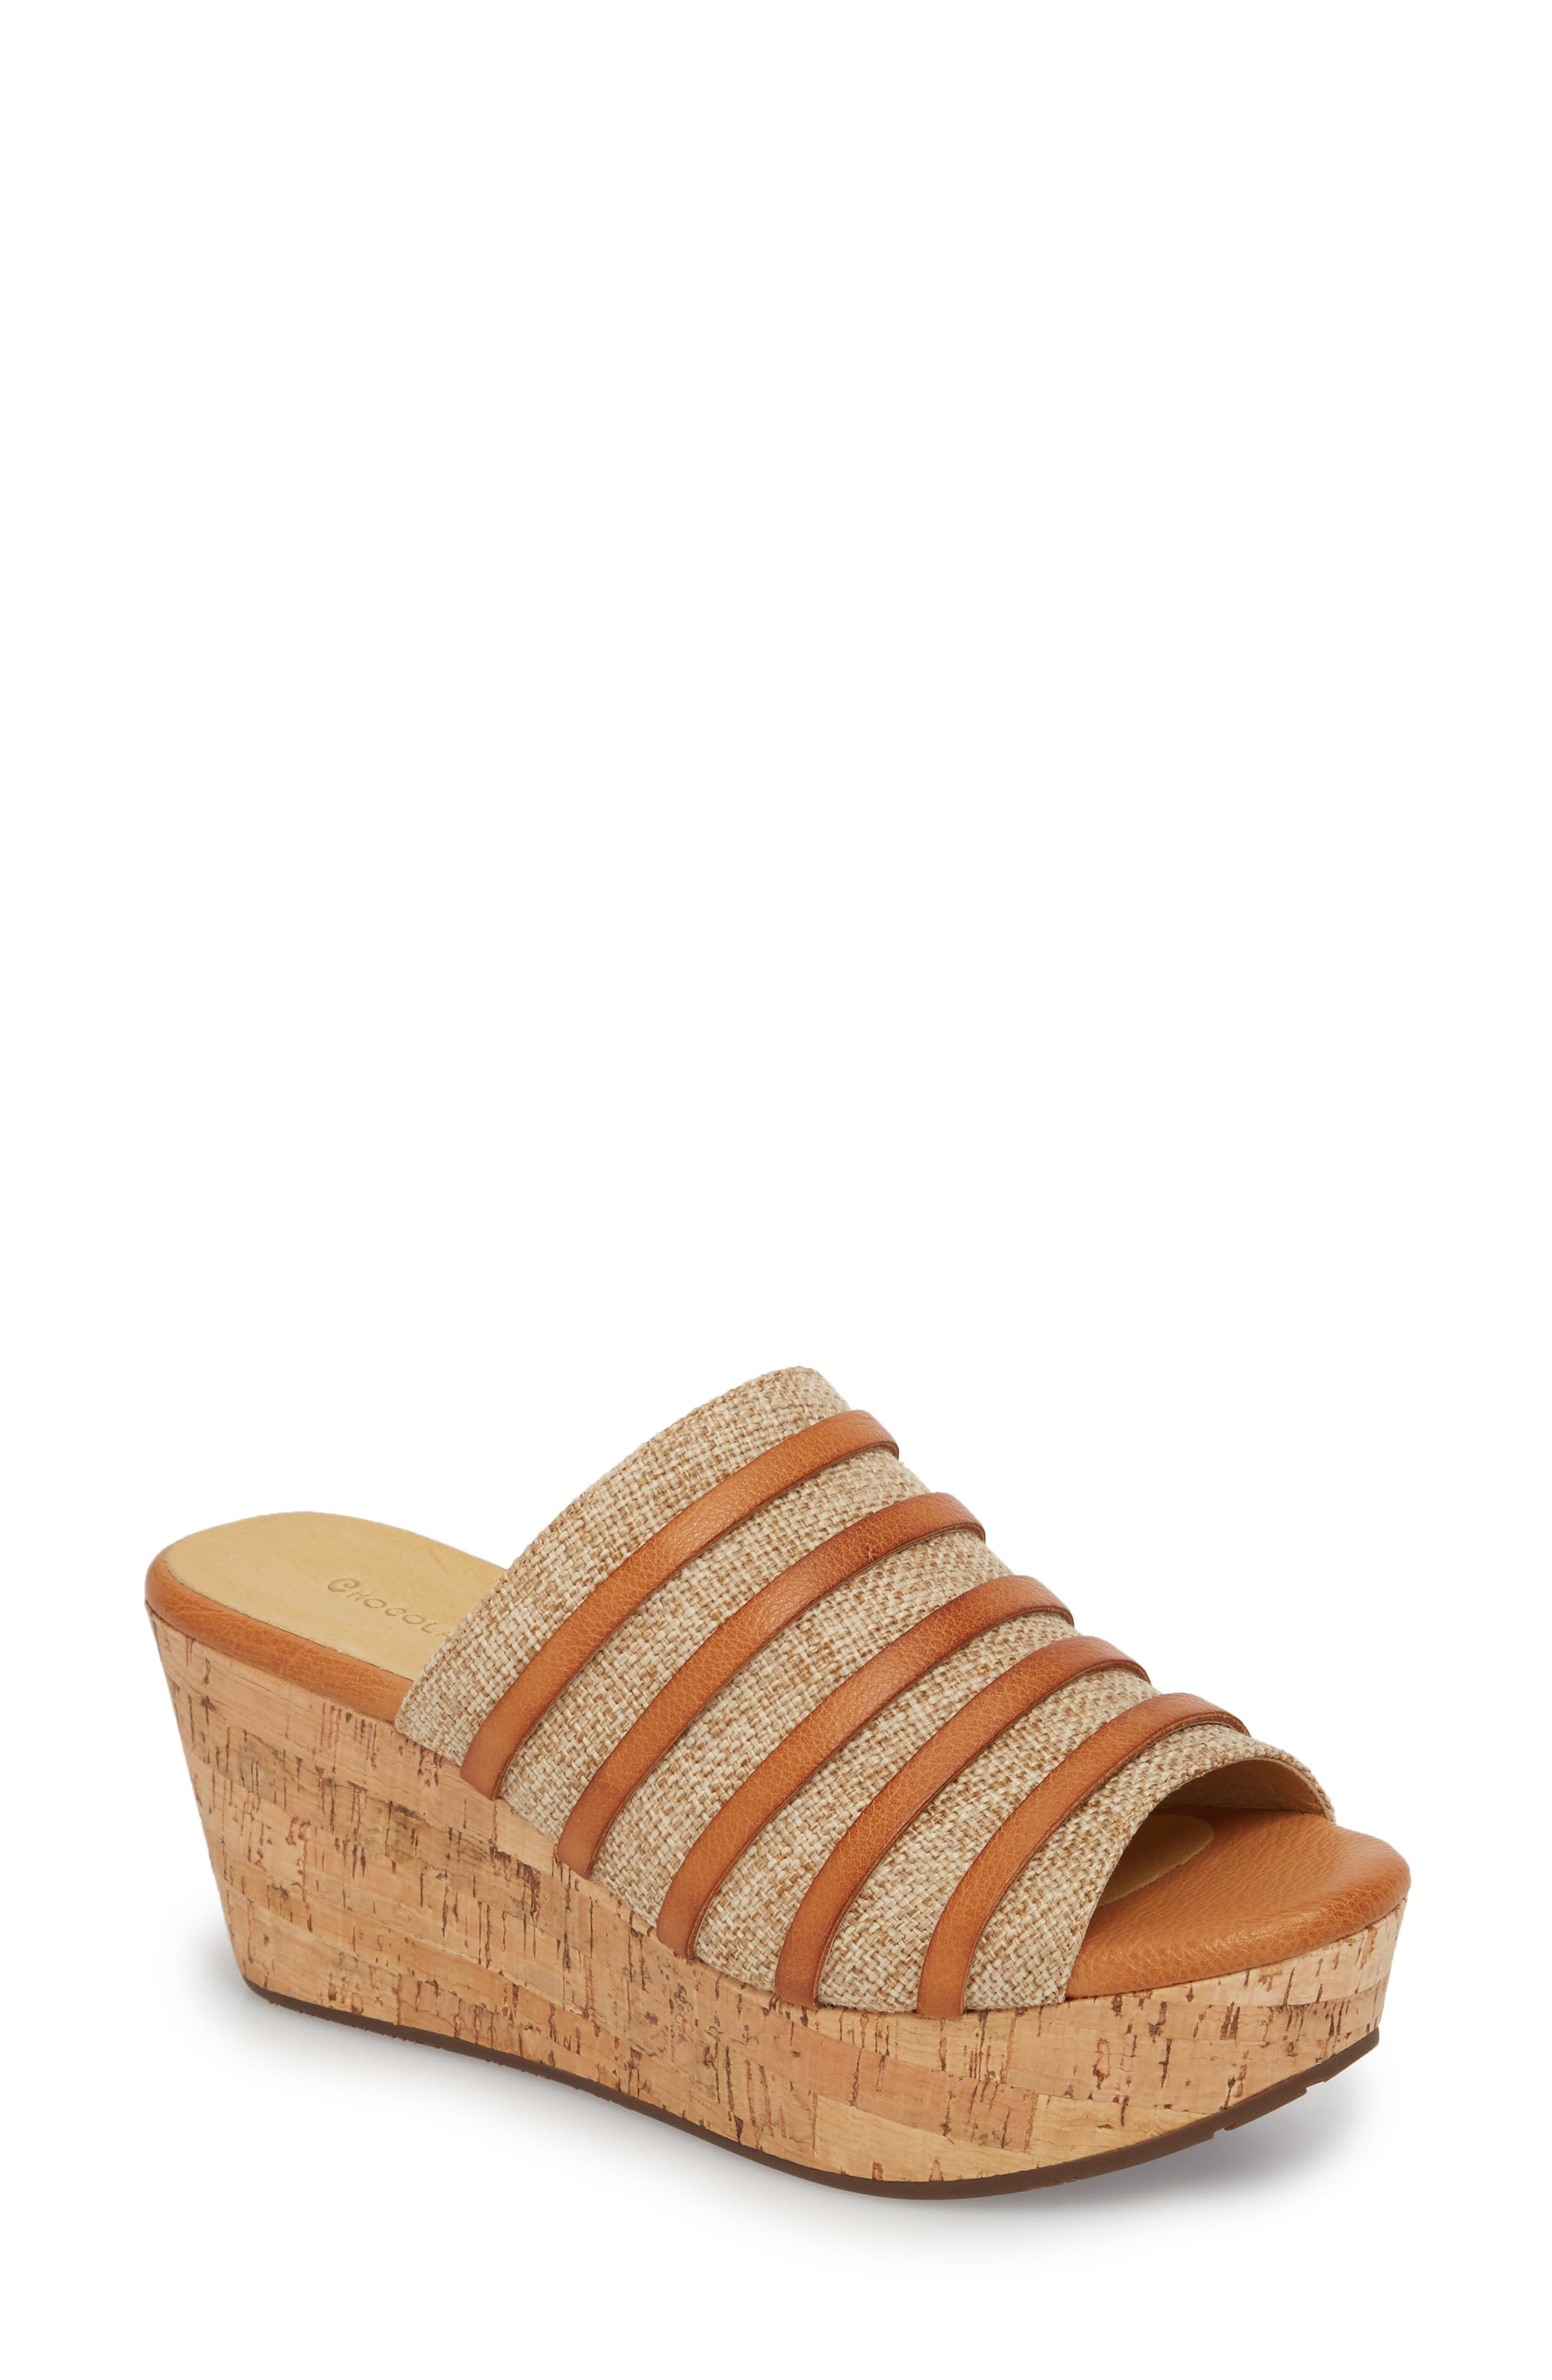 Wapi Wedge Sandal,                         Main,                         color,